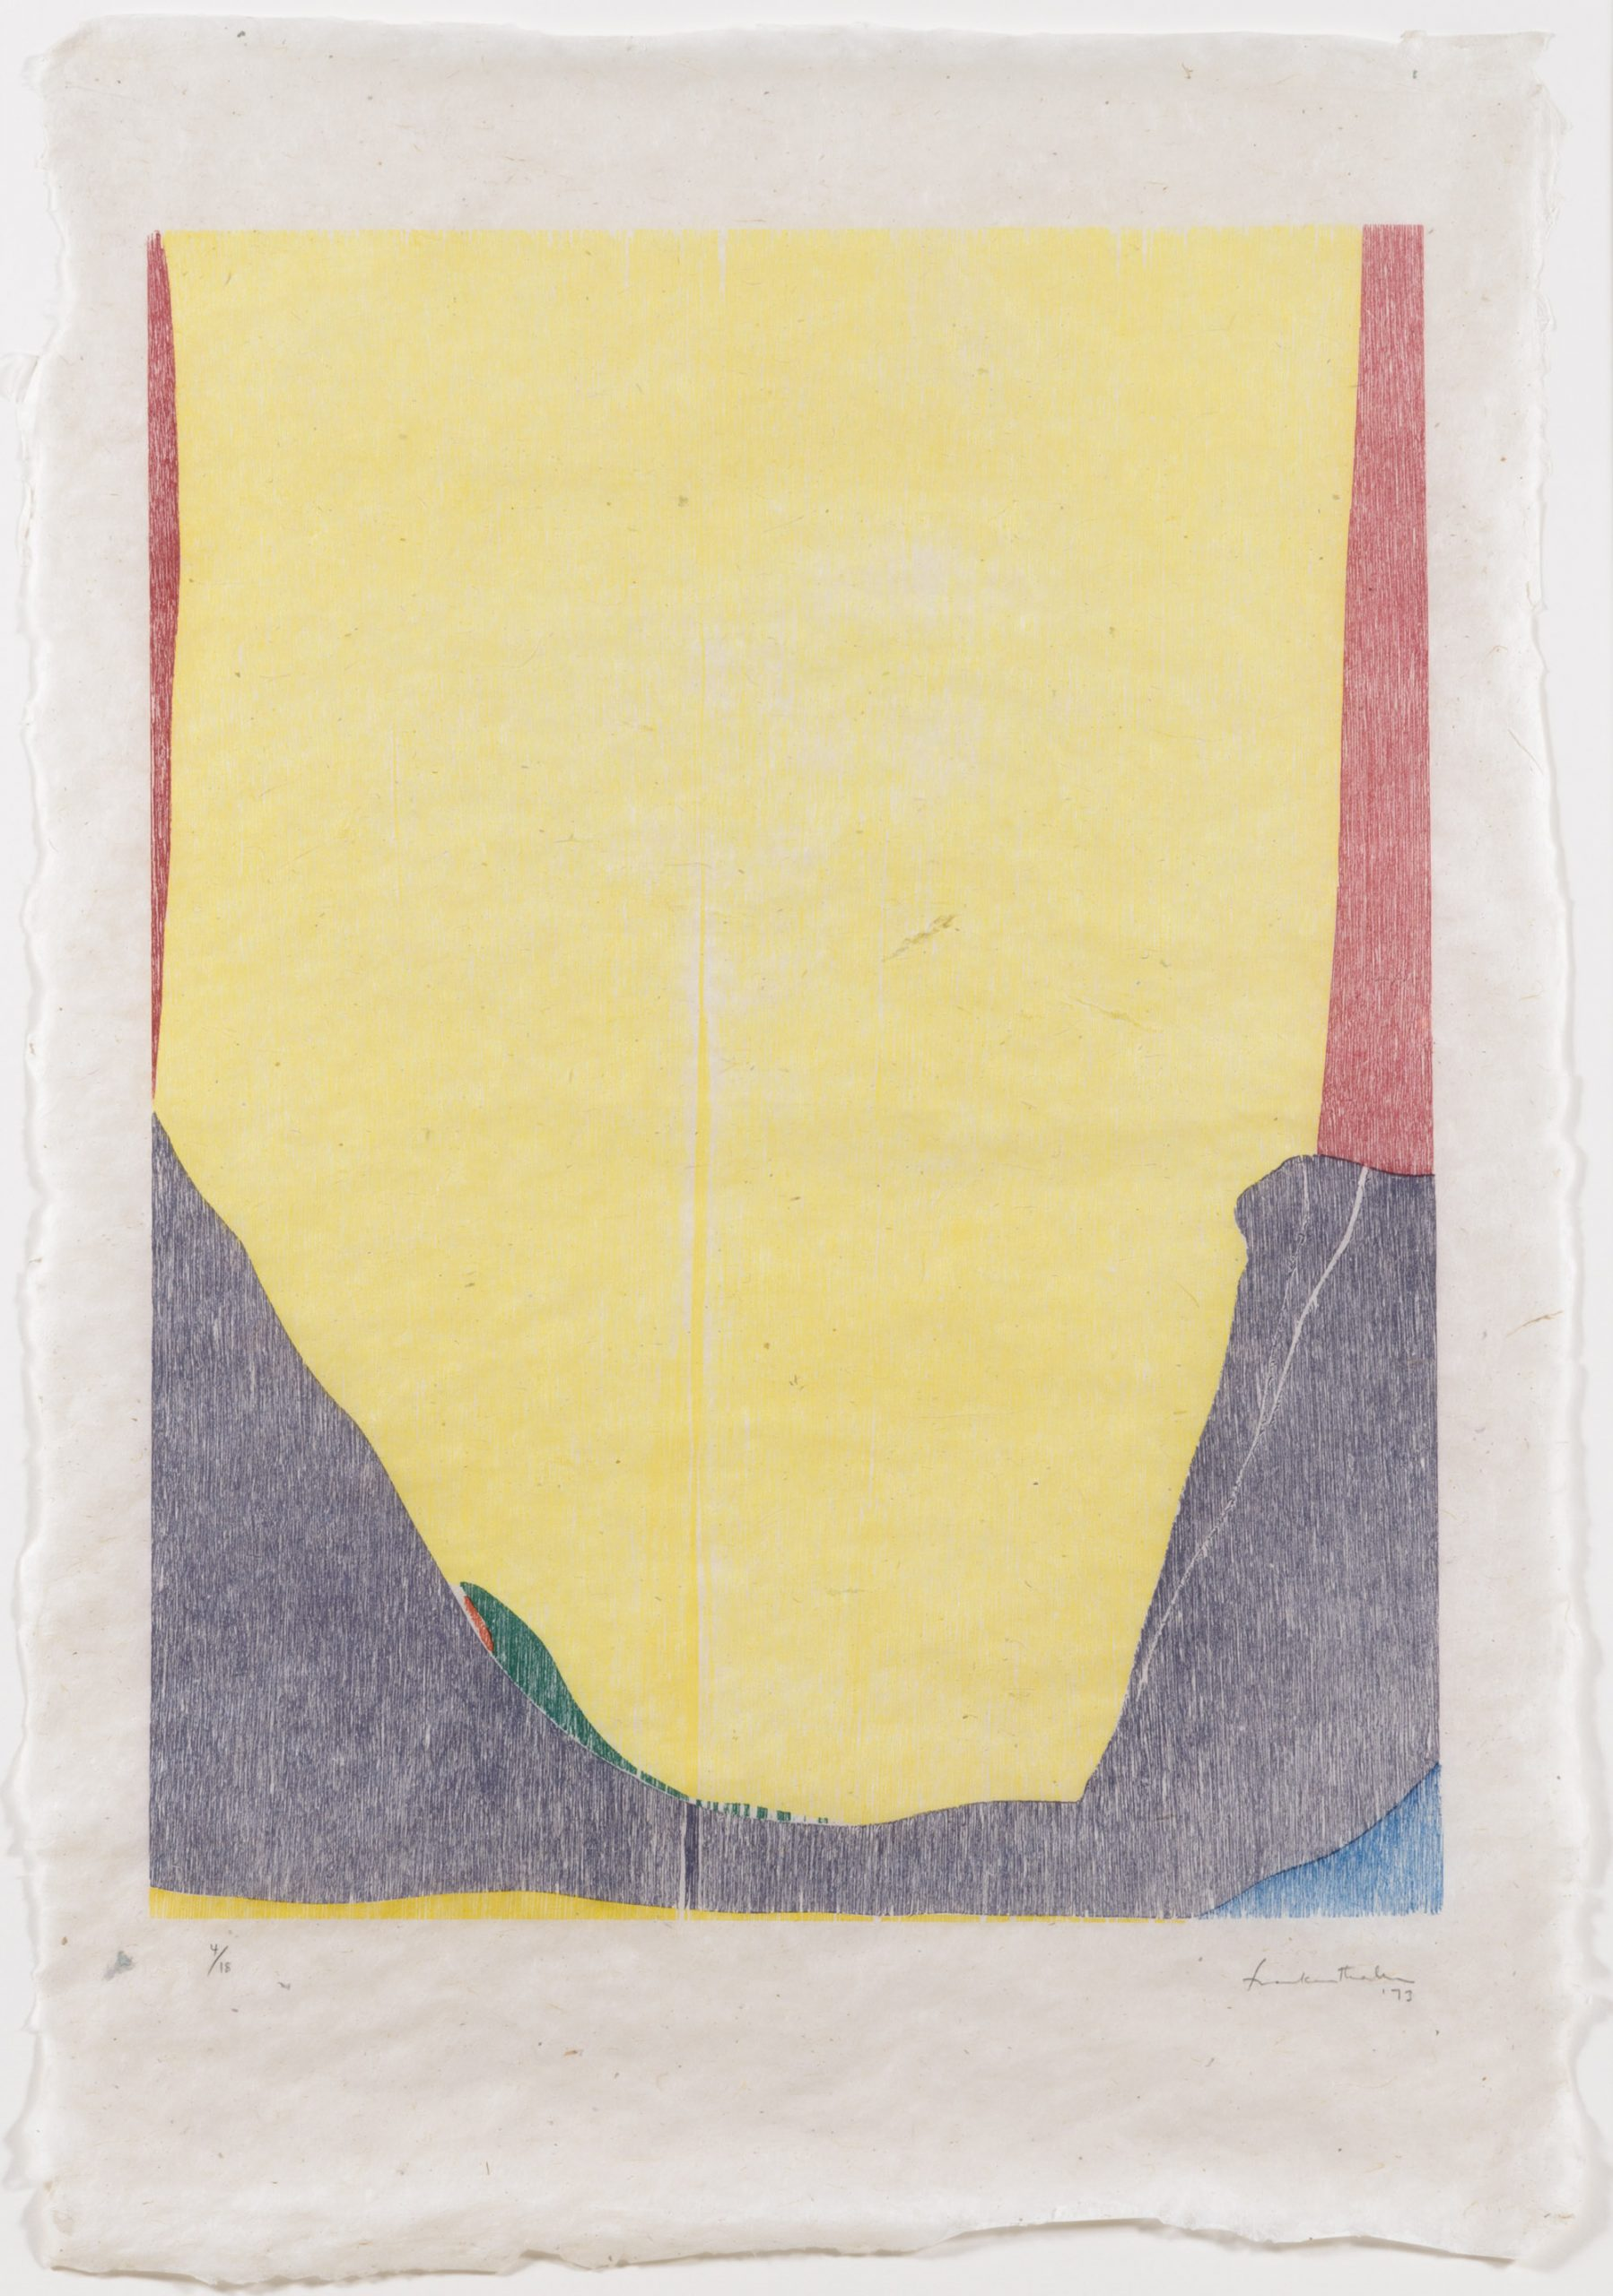 East and Beyond by Helen Frankenthaler